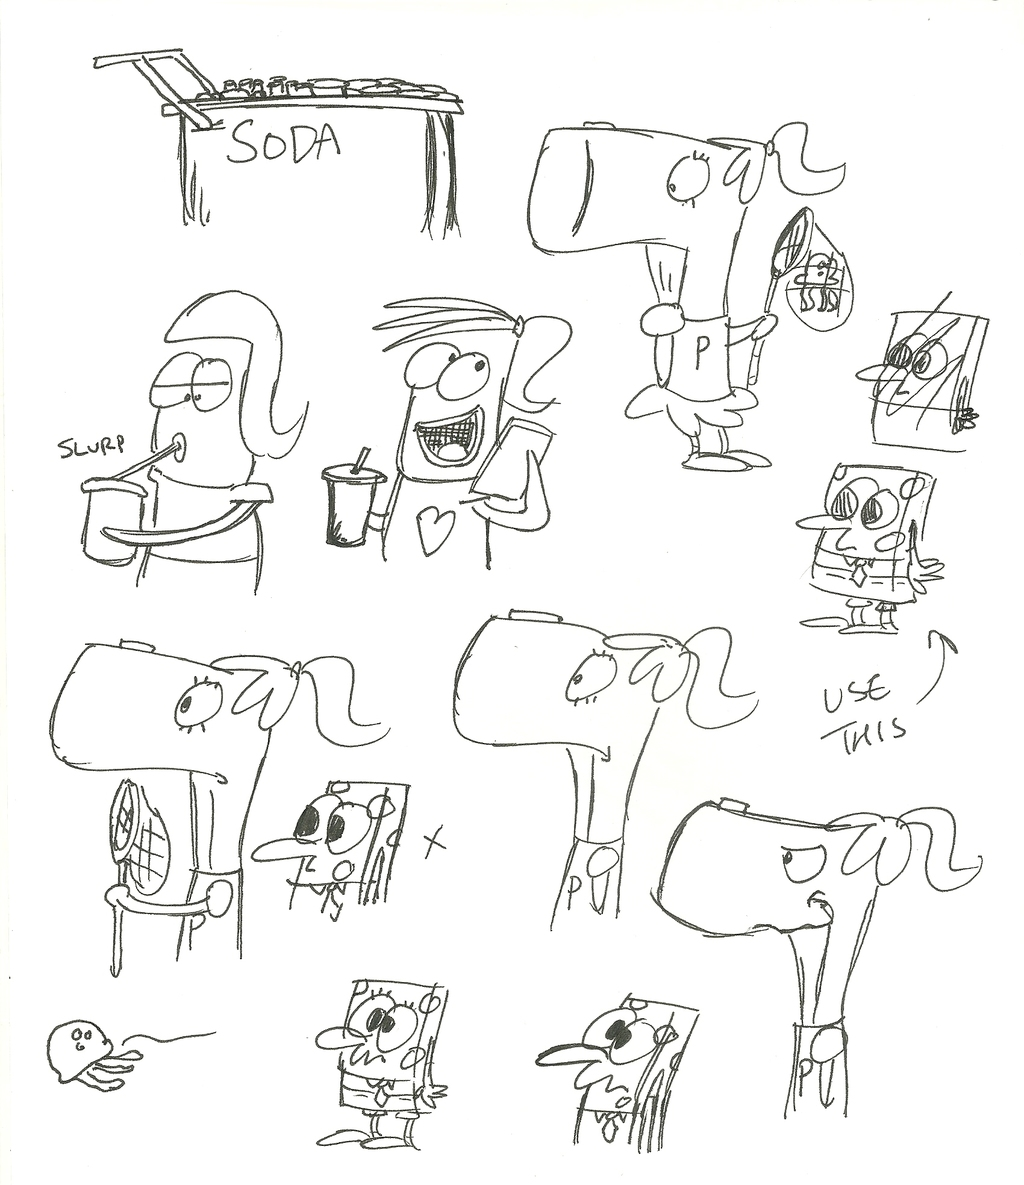 SpongeBob sketches